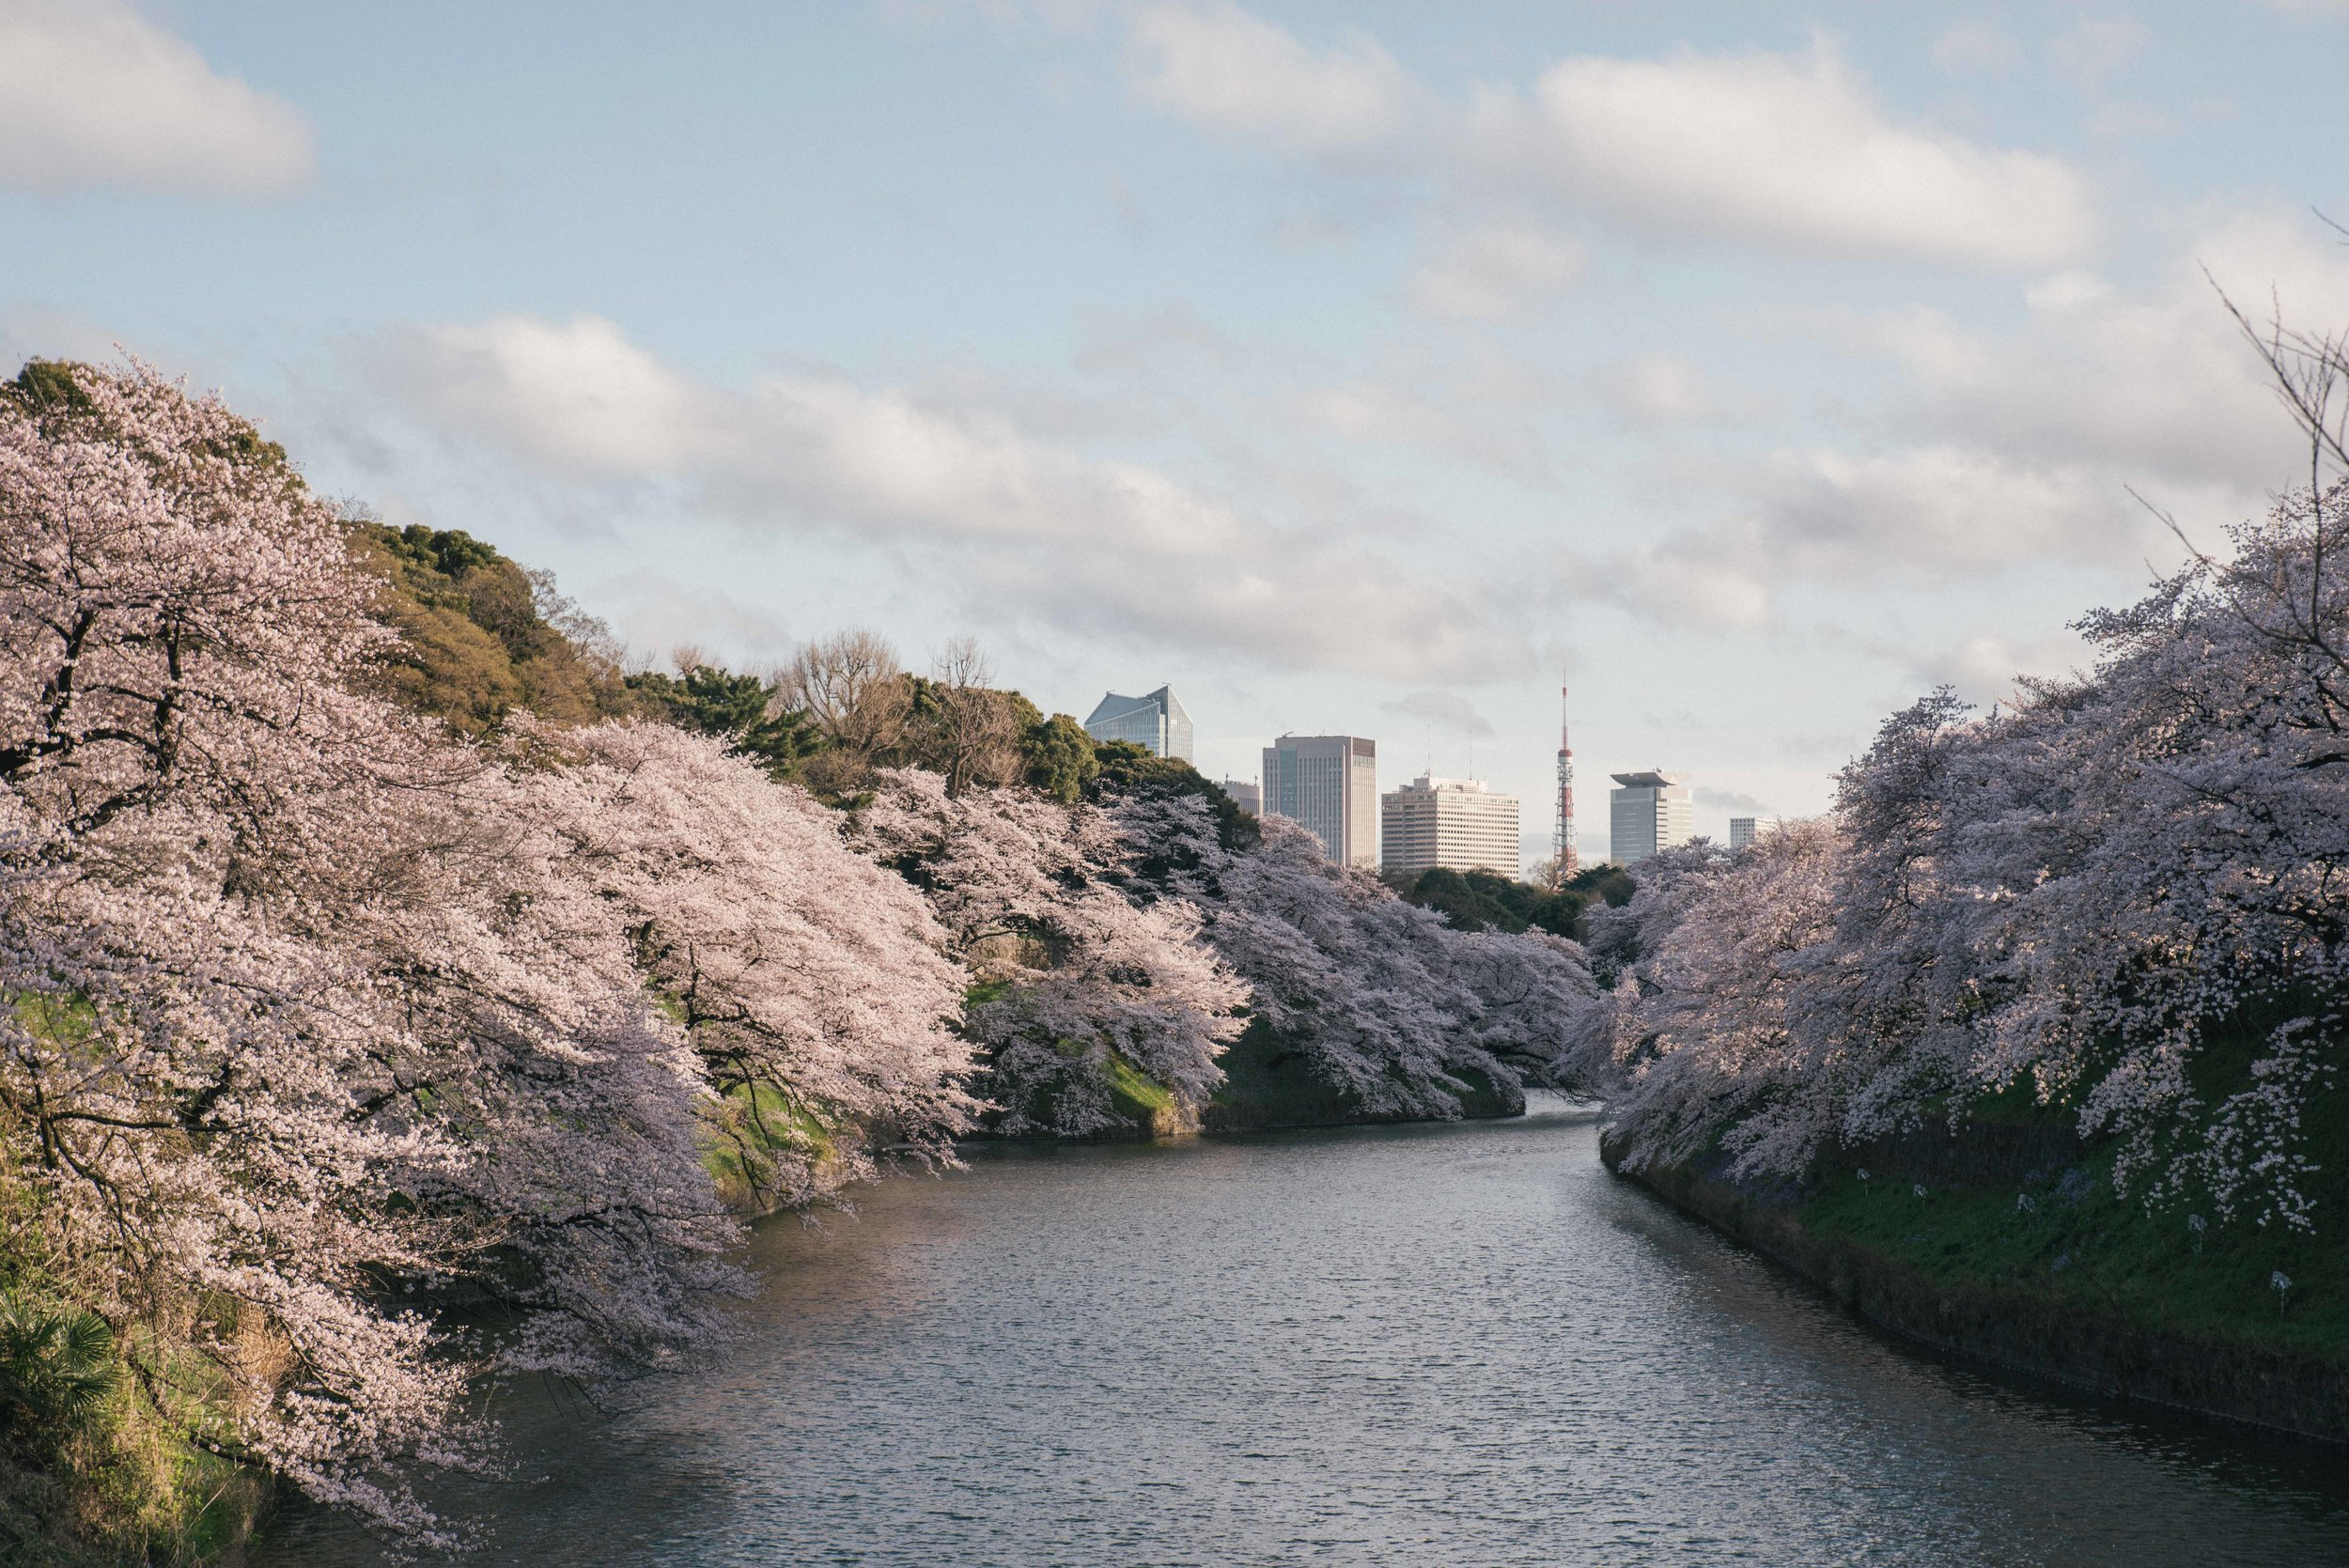 Cherry Blossom trees in bloom near Chidorigafuchi in central Tokyo